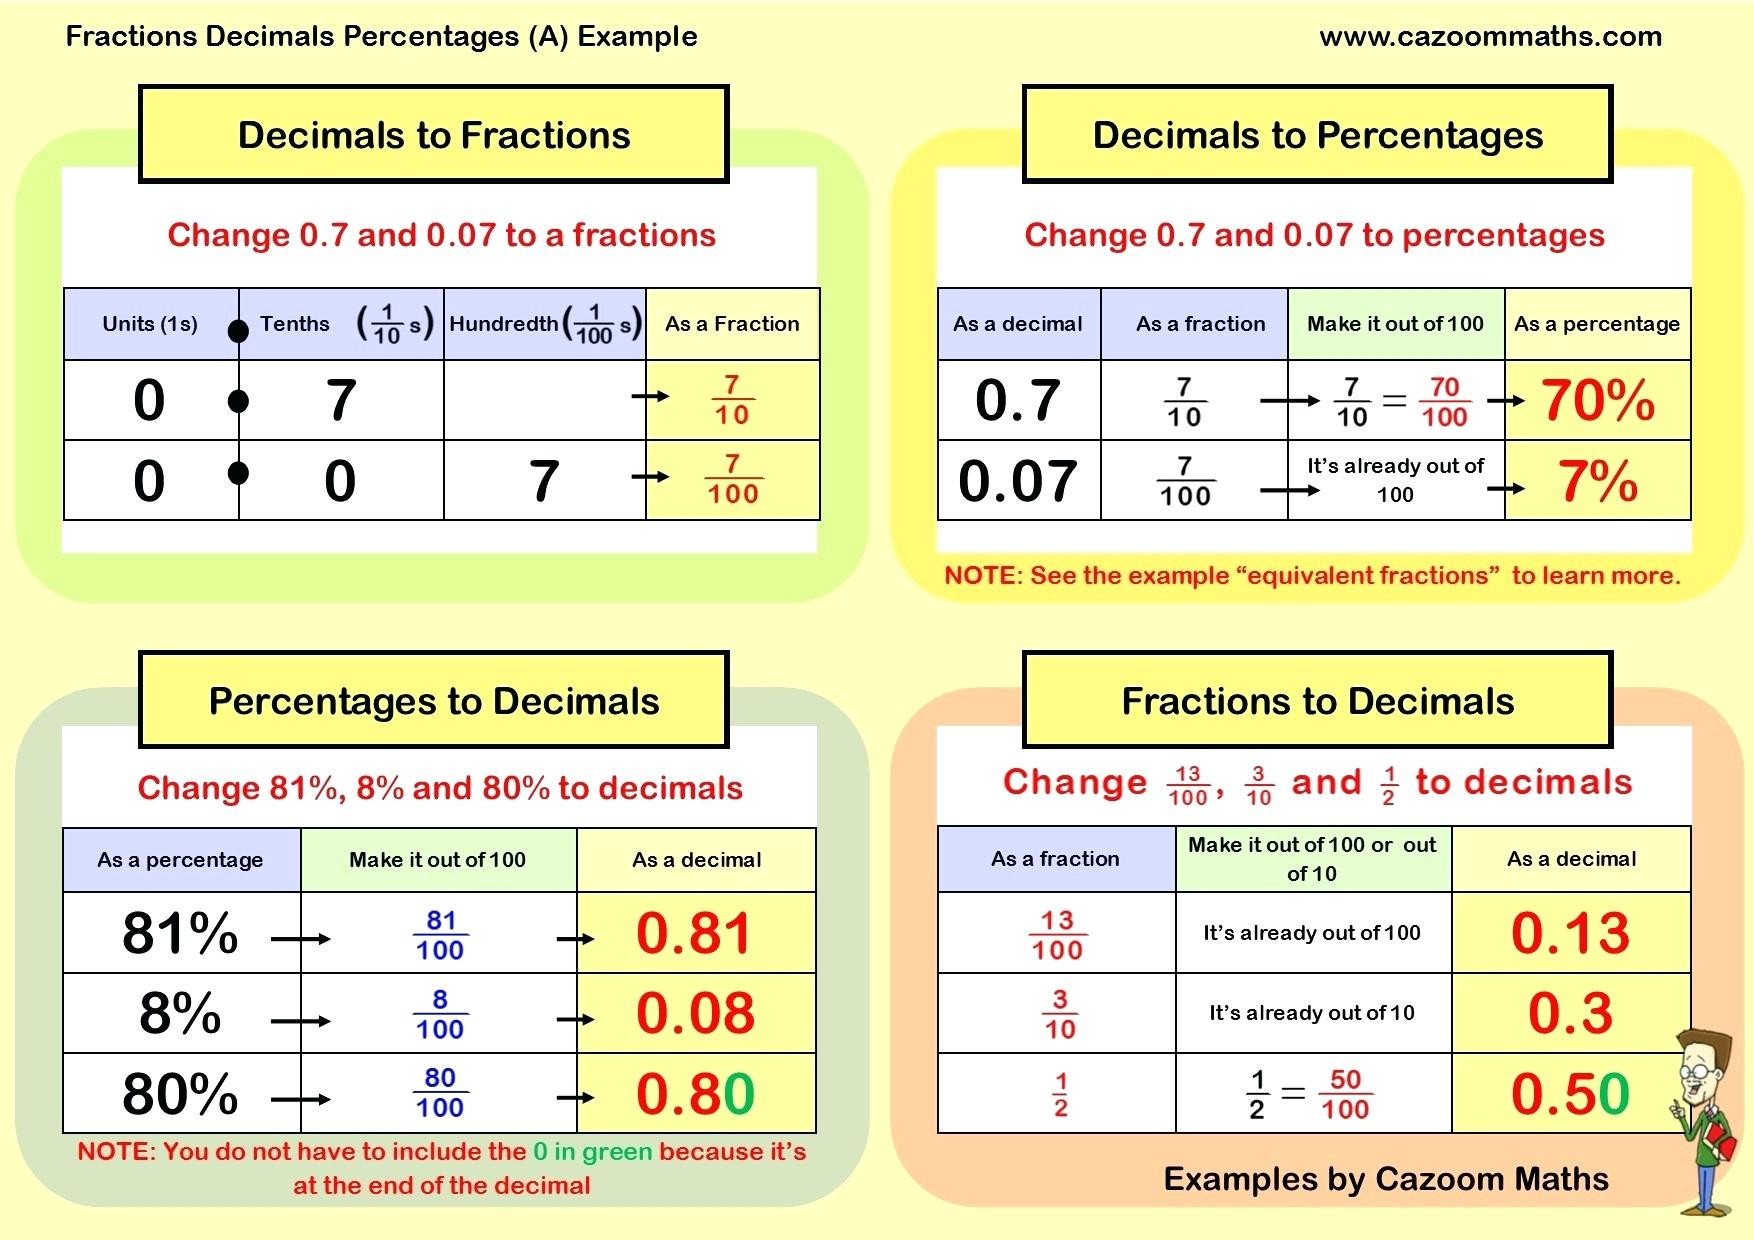 30 Fraction Decimal Percent Conversion Worksheet